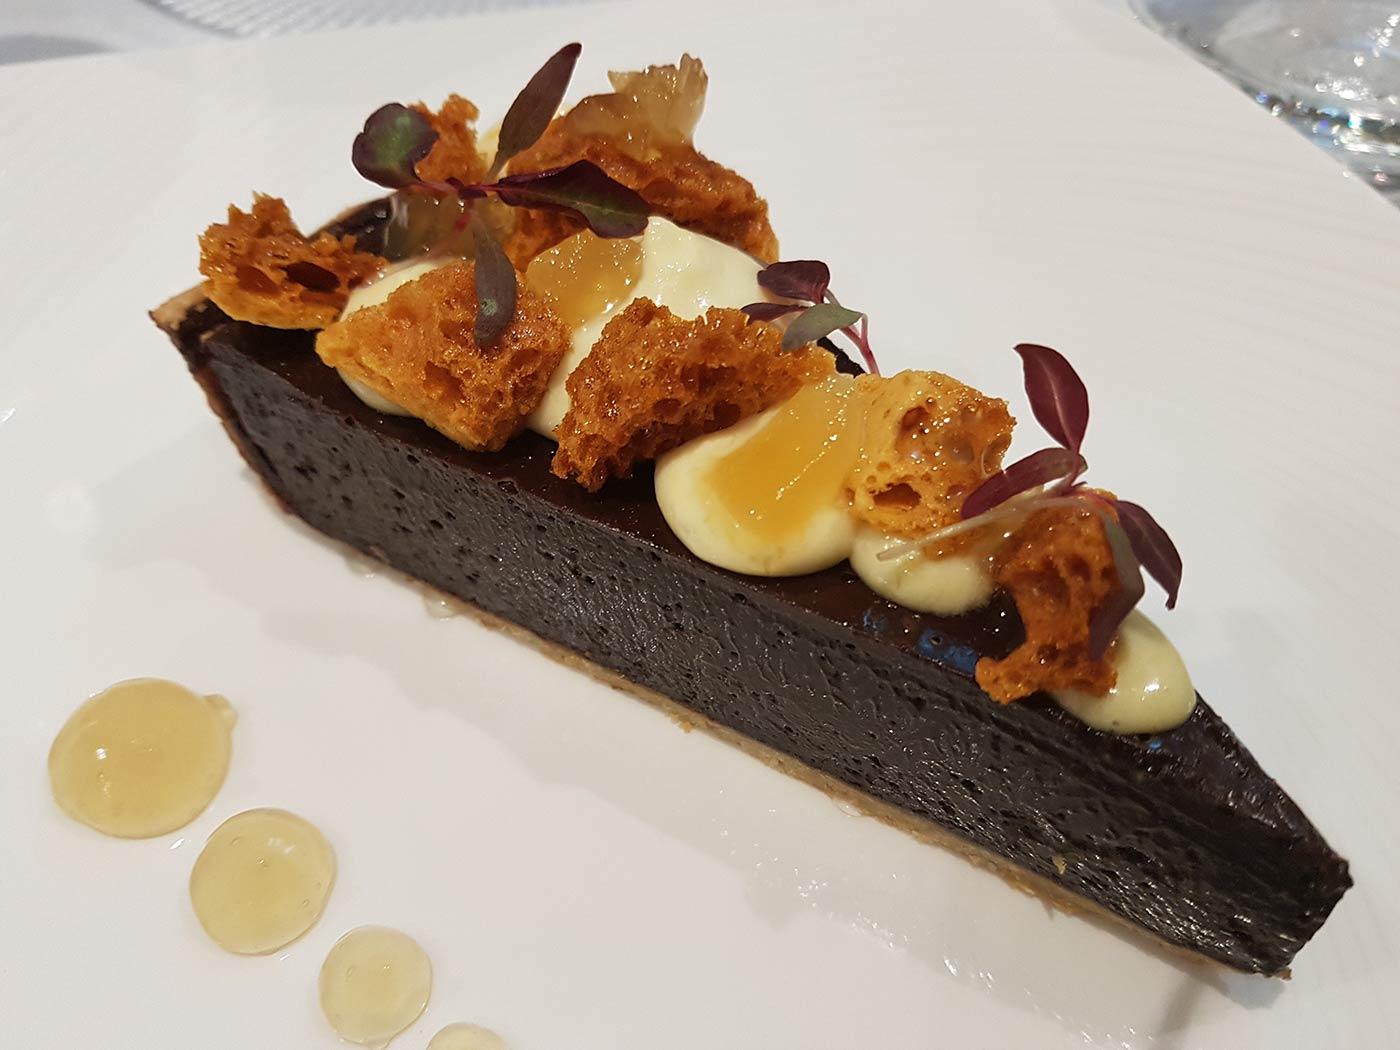 Chocolate tart at Stones Restaurant